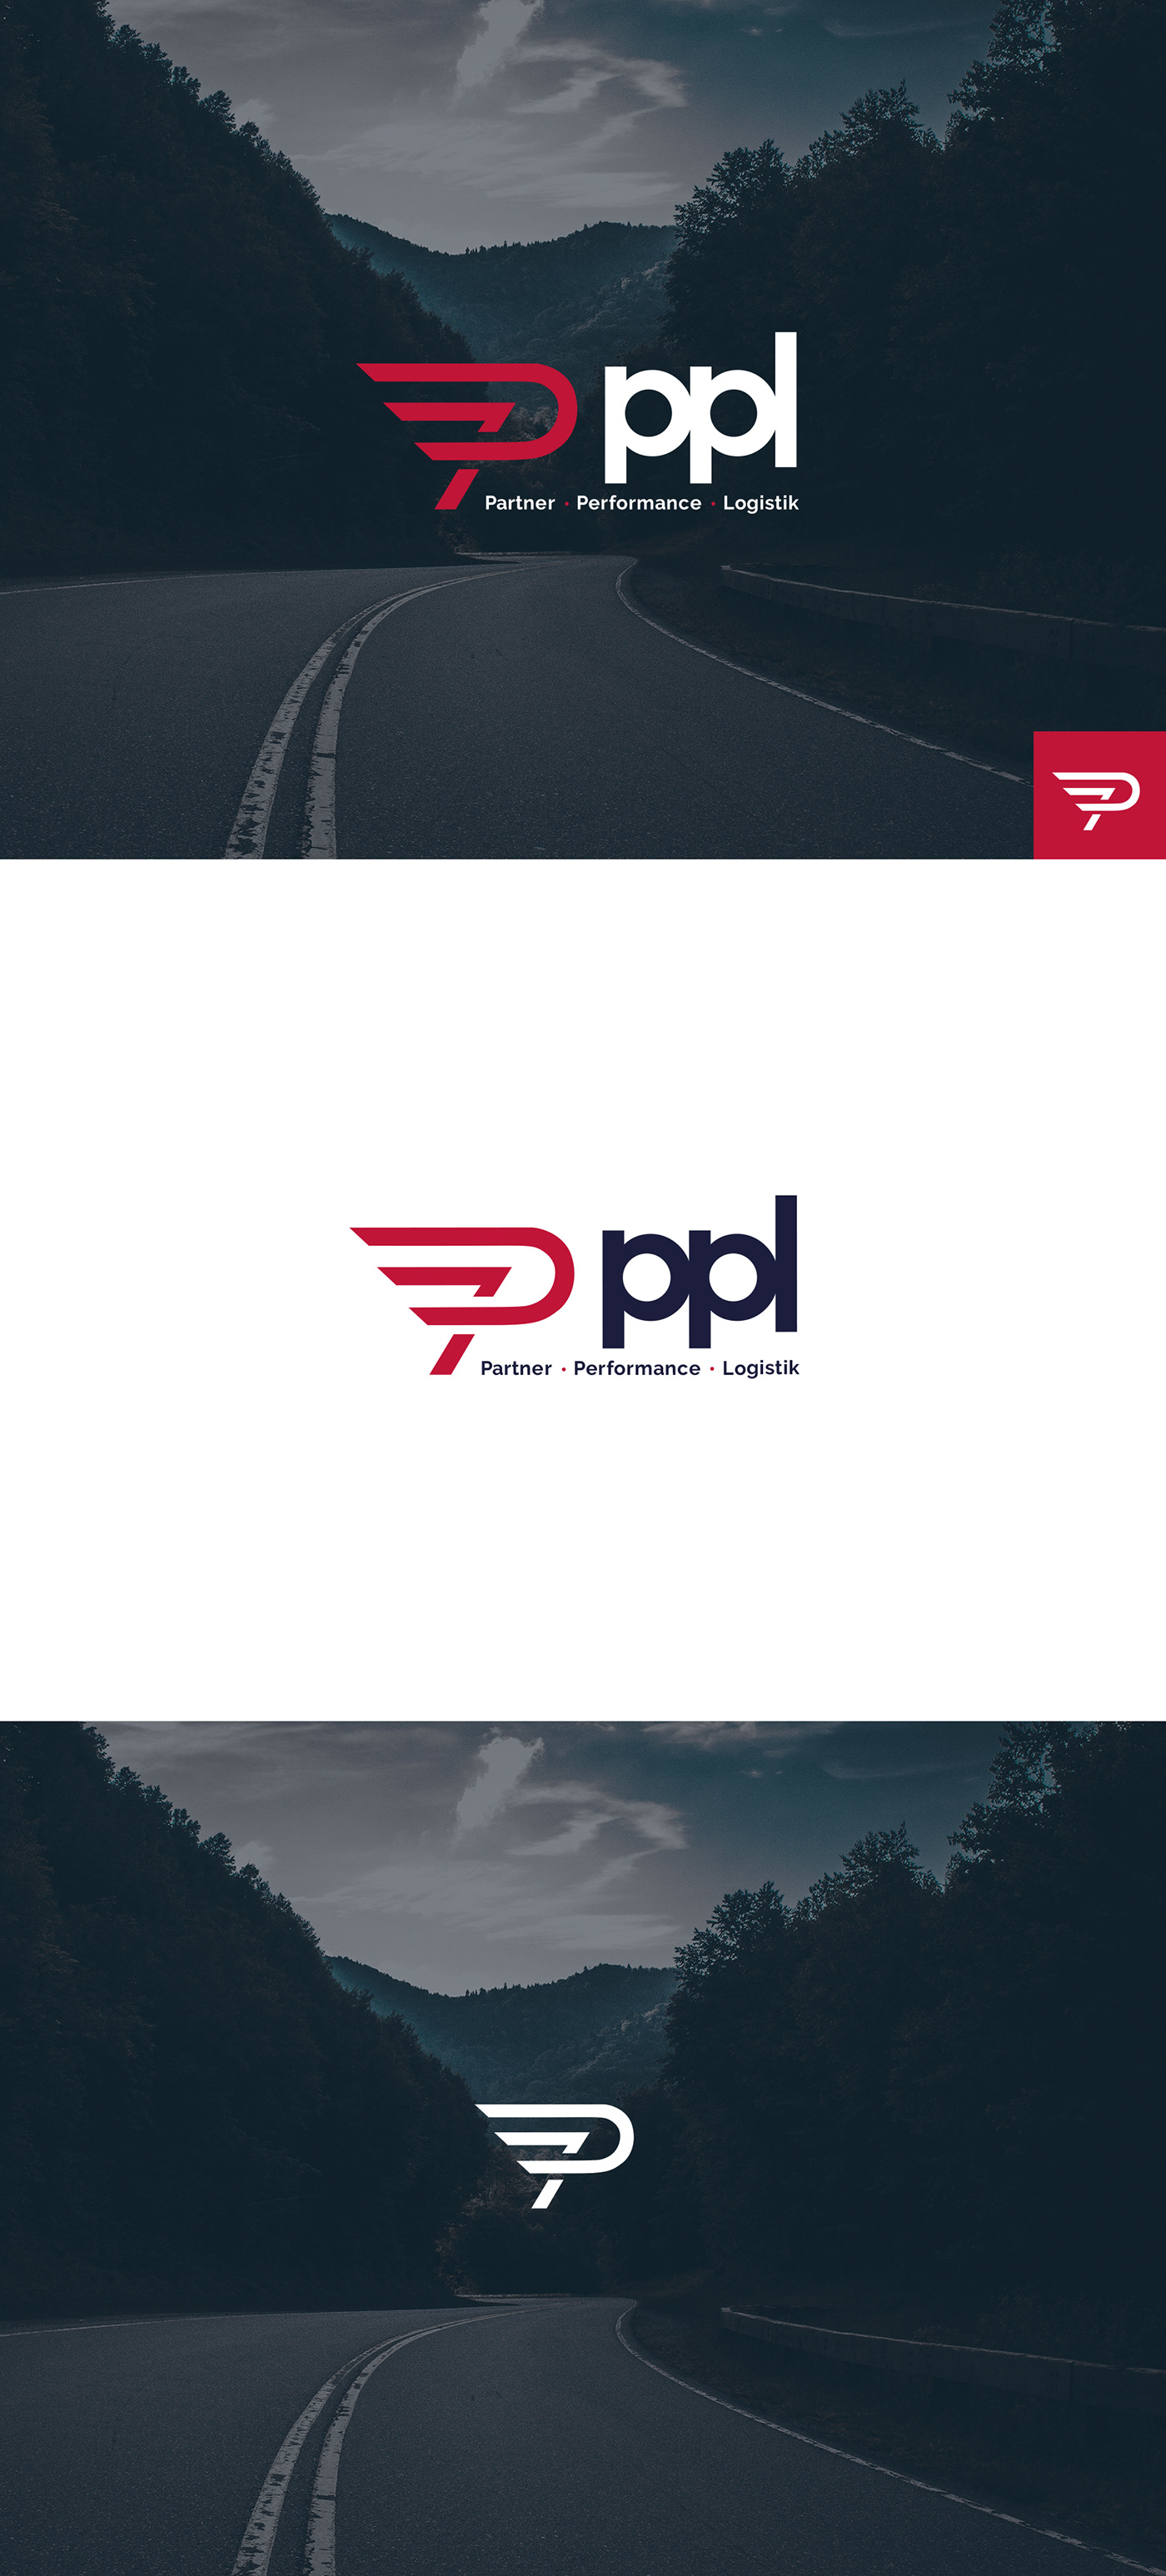 branding  corporatedesign logo logodesign